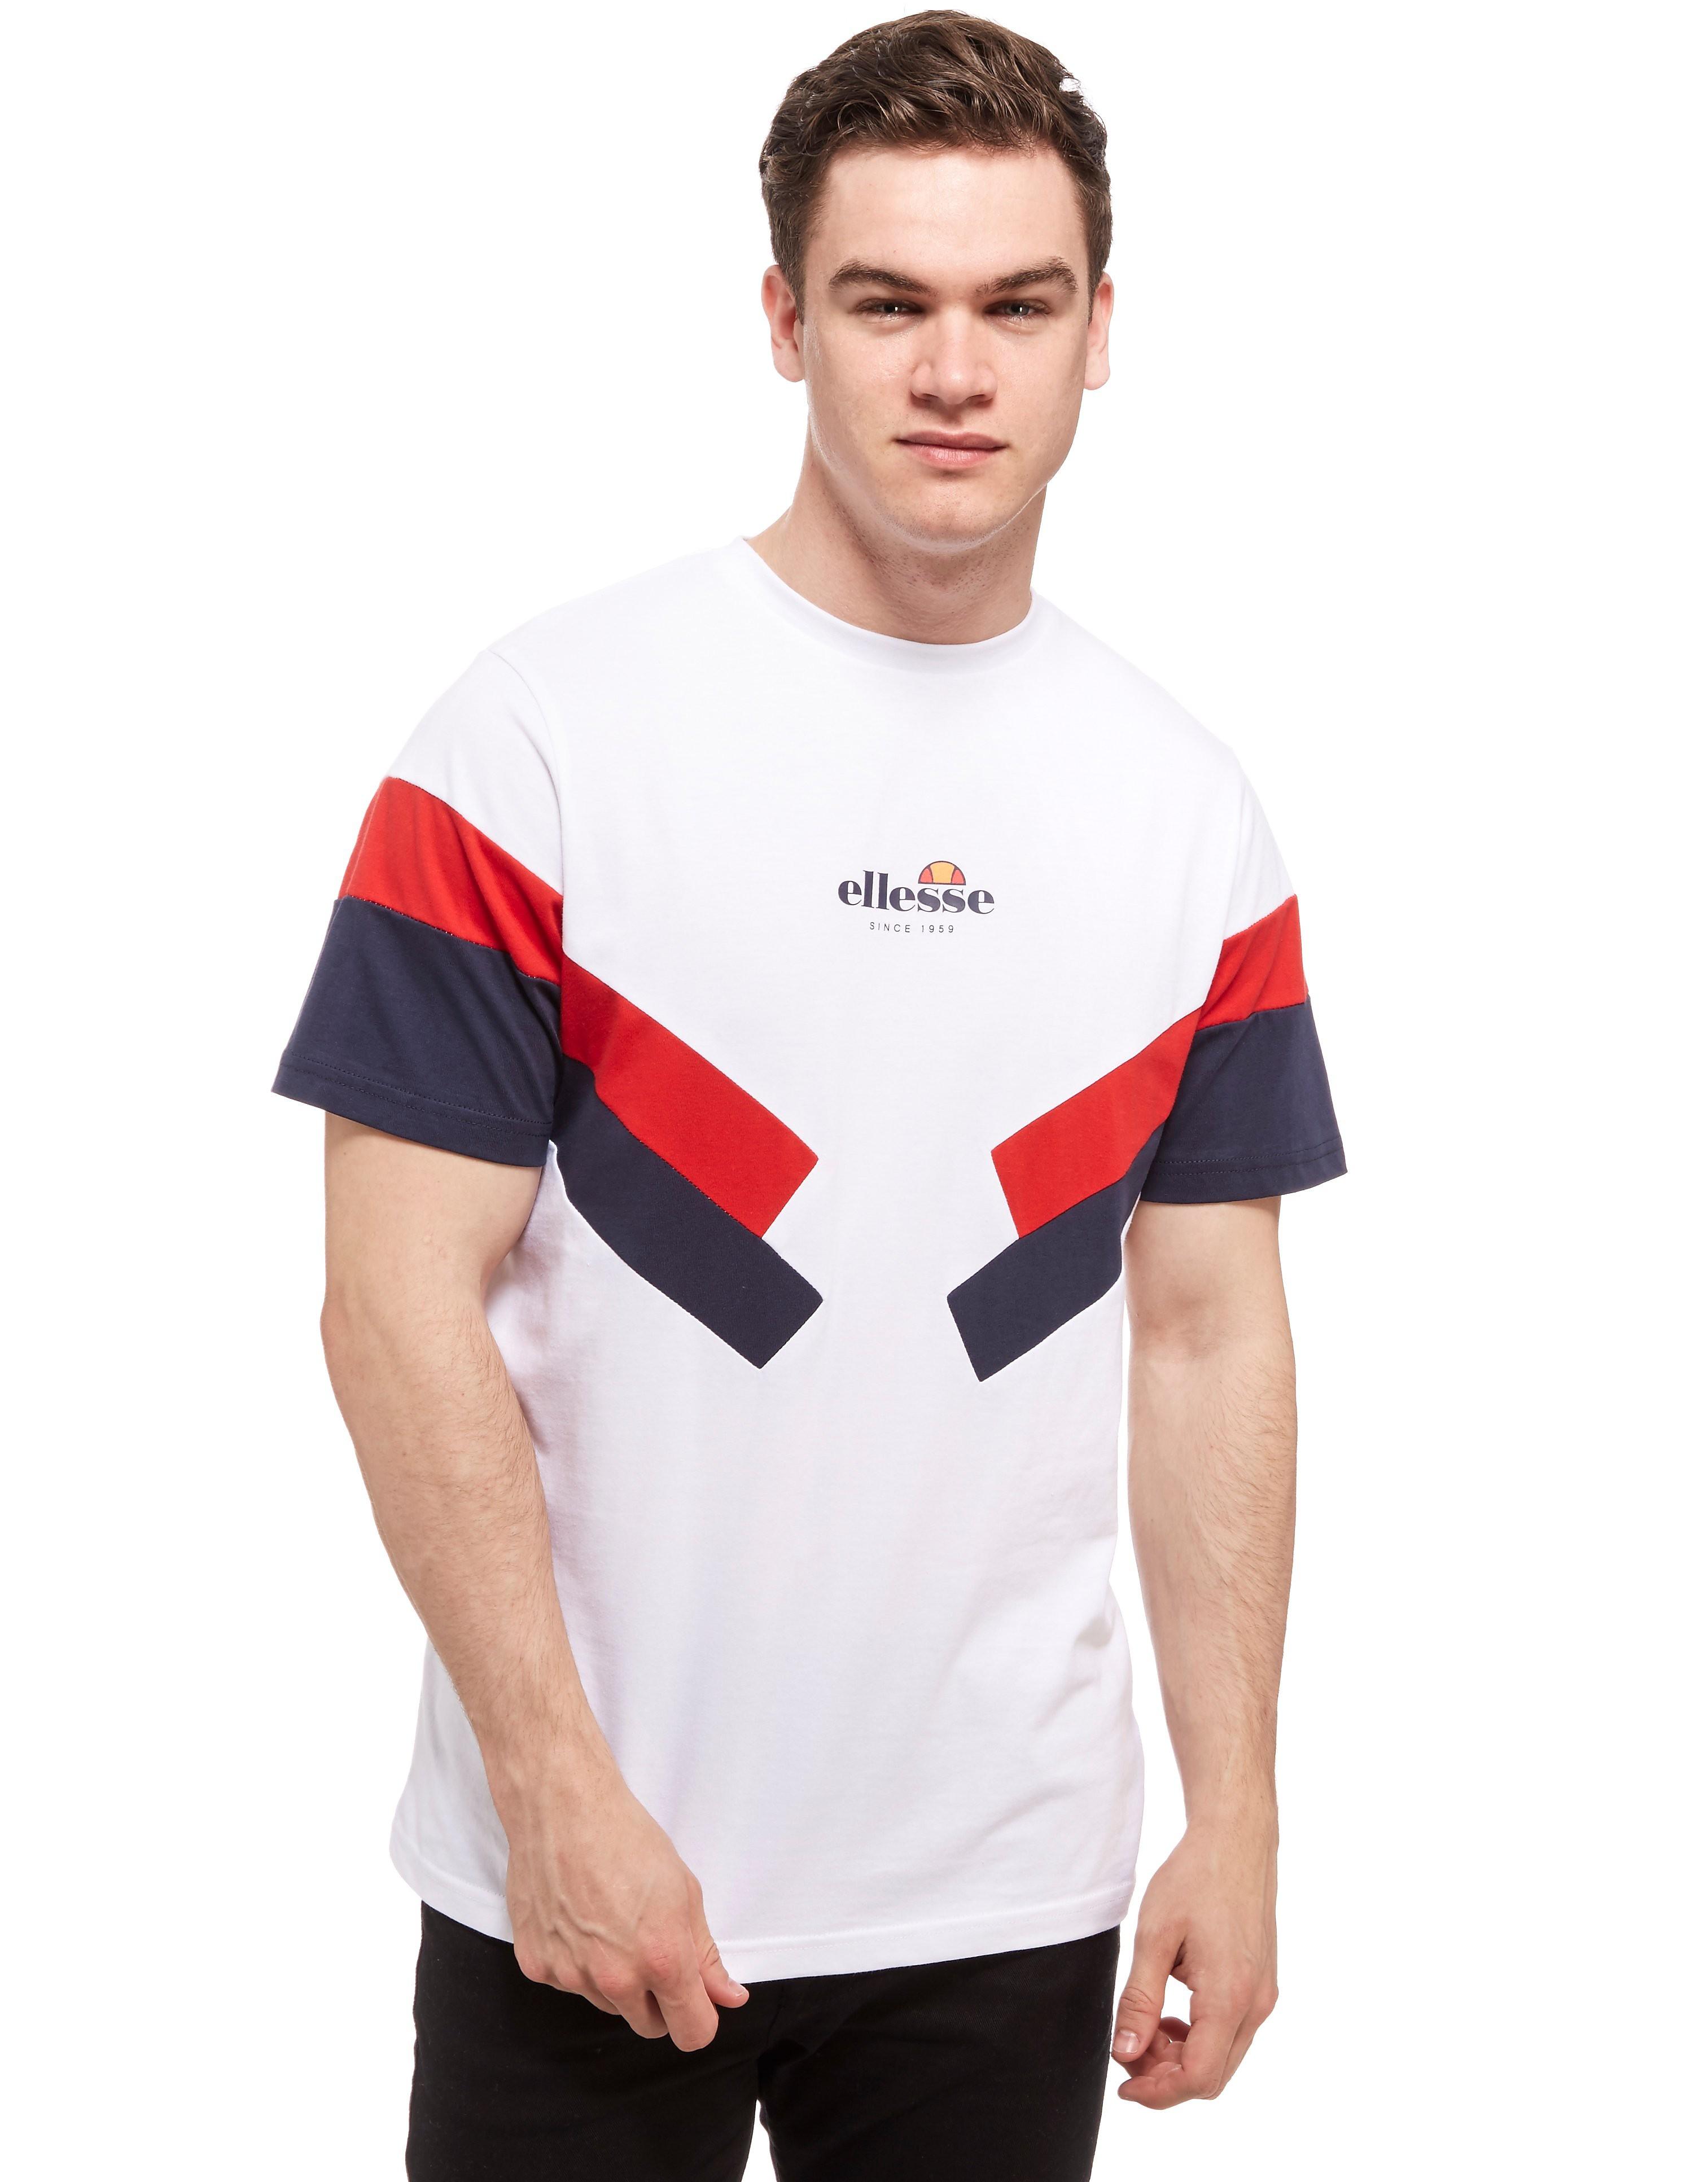 Ellesse Zardini T-Shirt